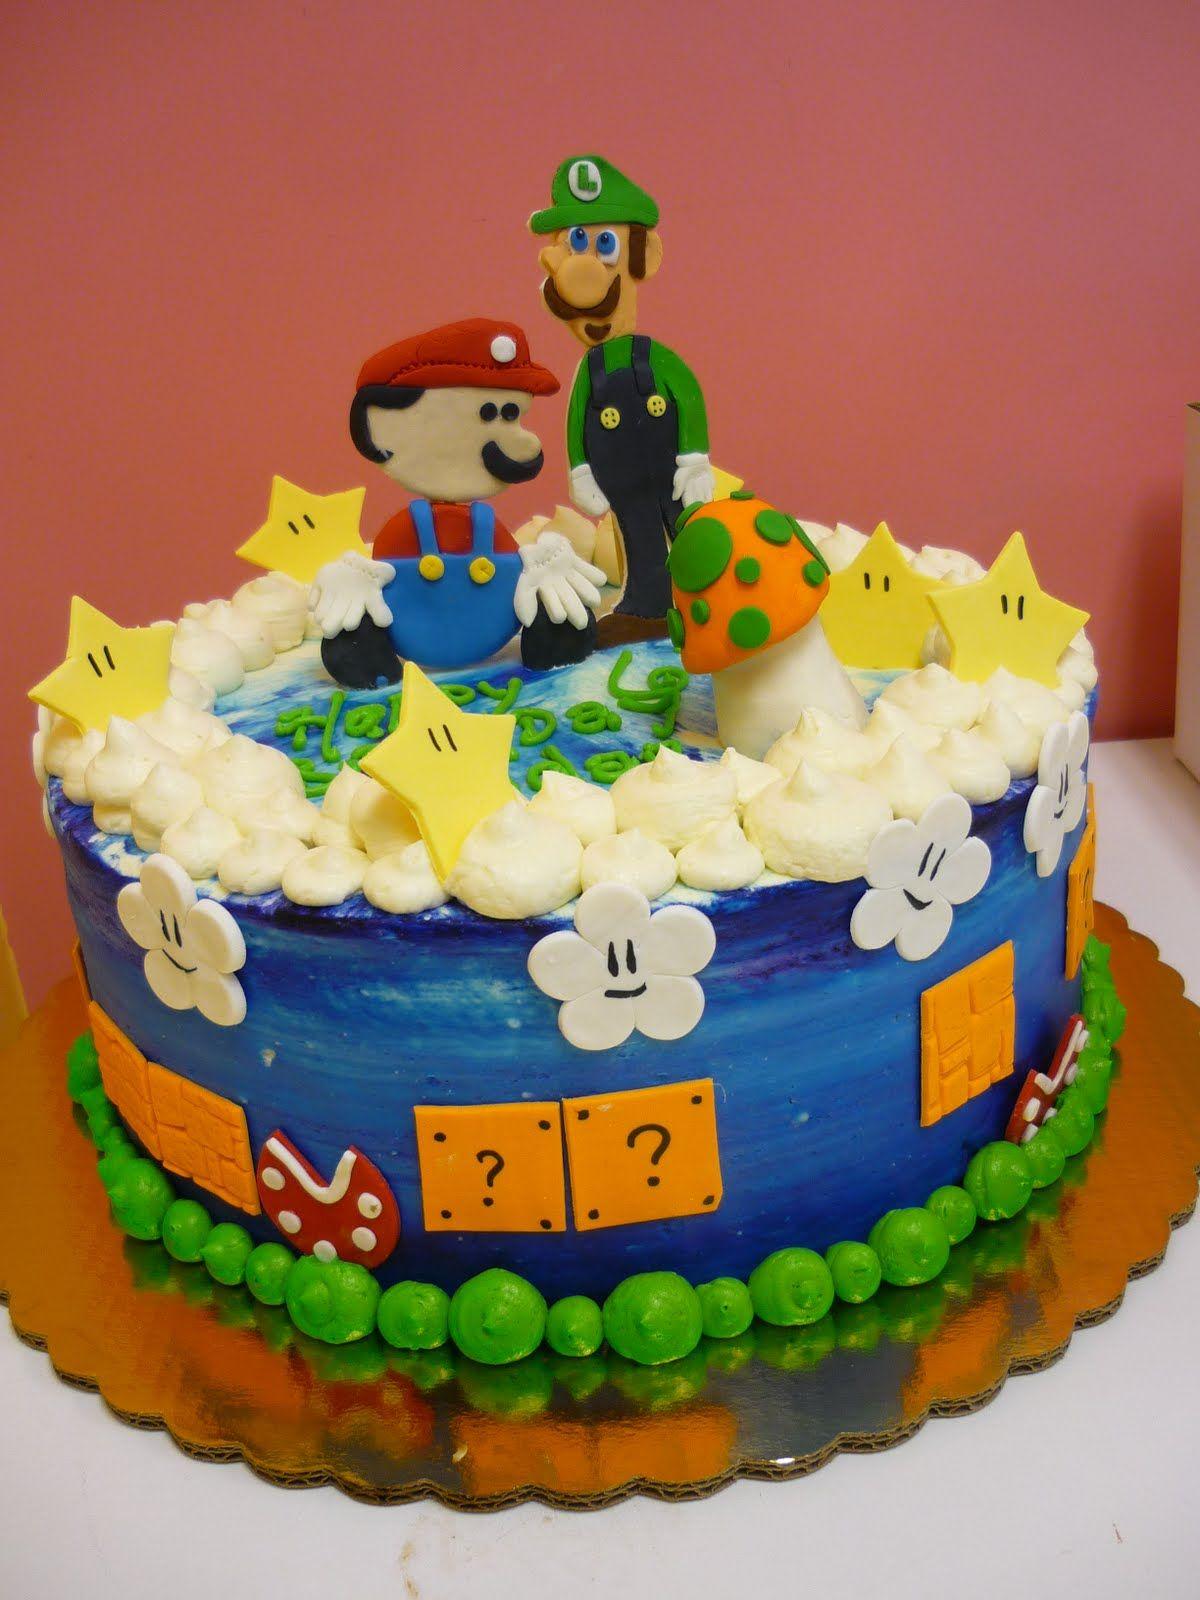 Video Game Cakes Birthday Cake Kids Buttercream Birthday Cakes - Video game birthday cake